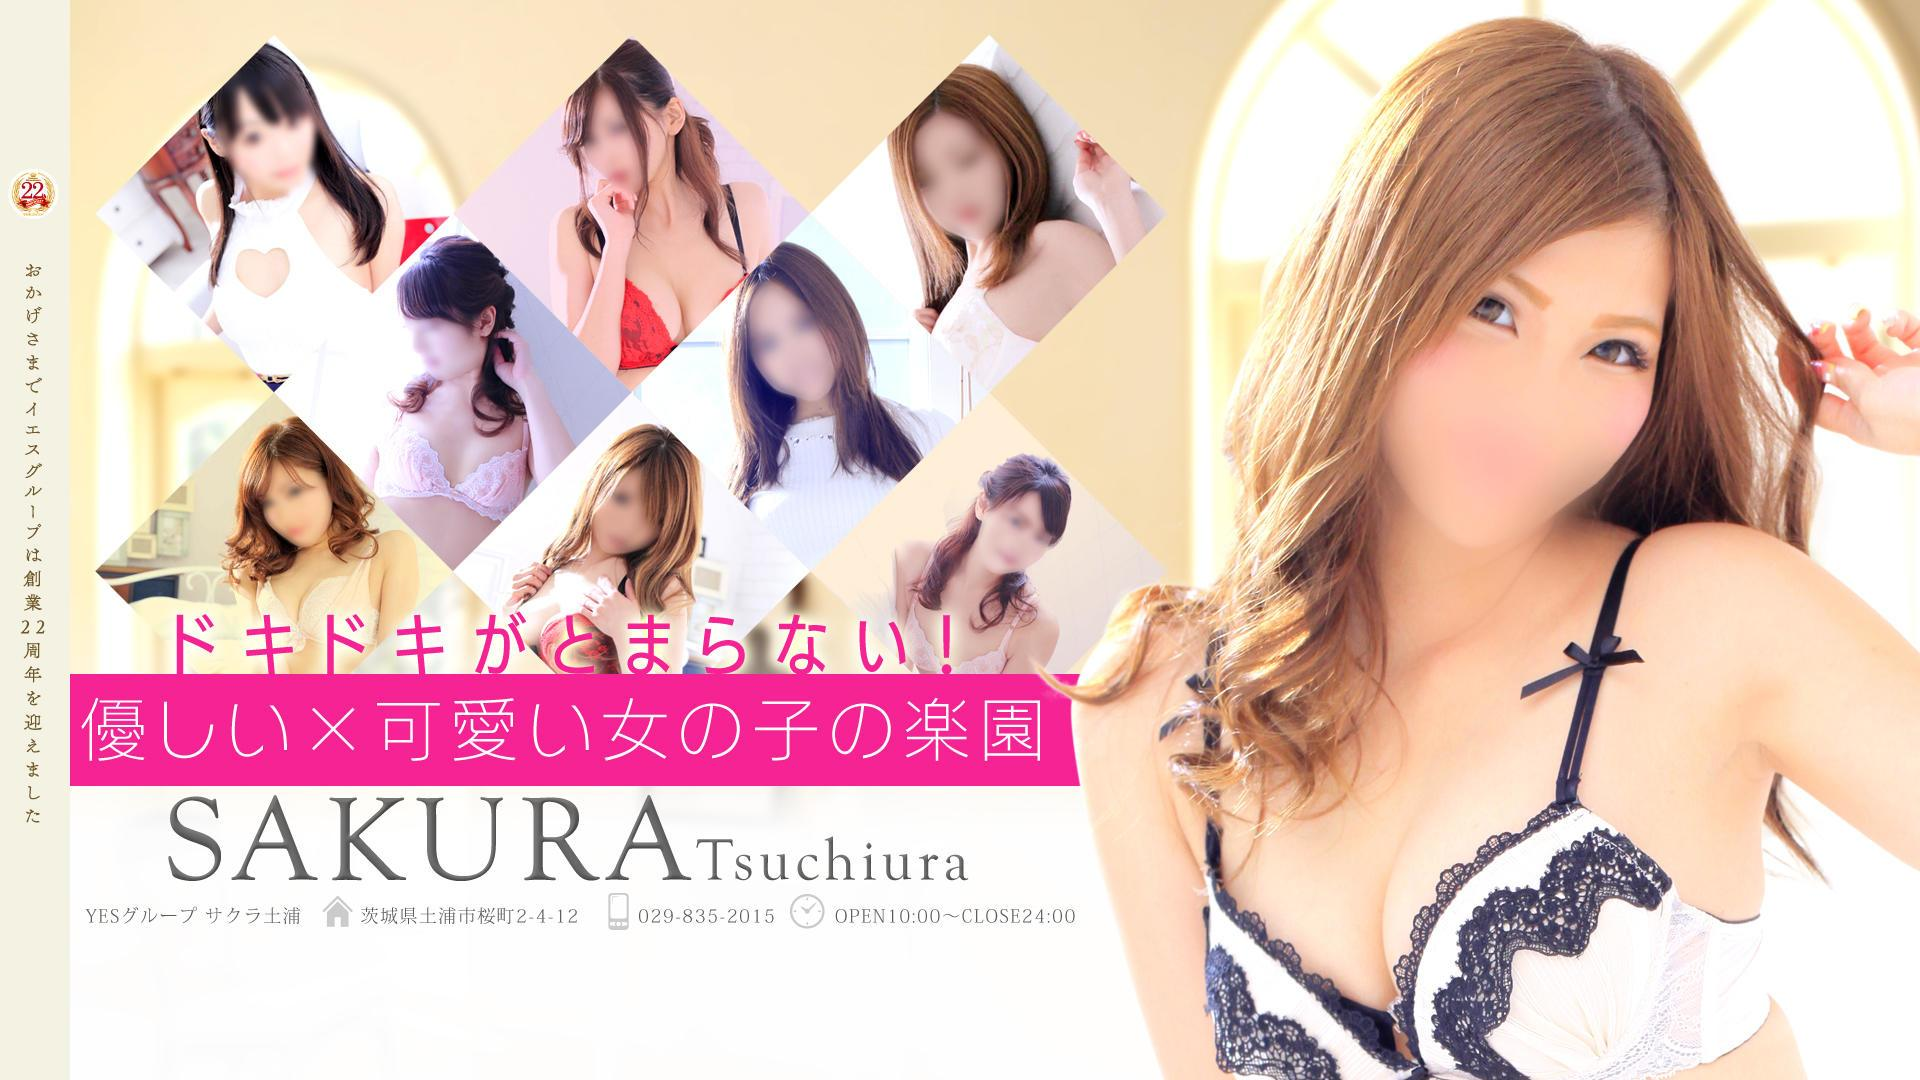 Sakura 土浦